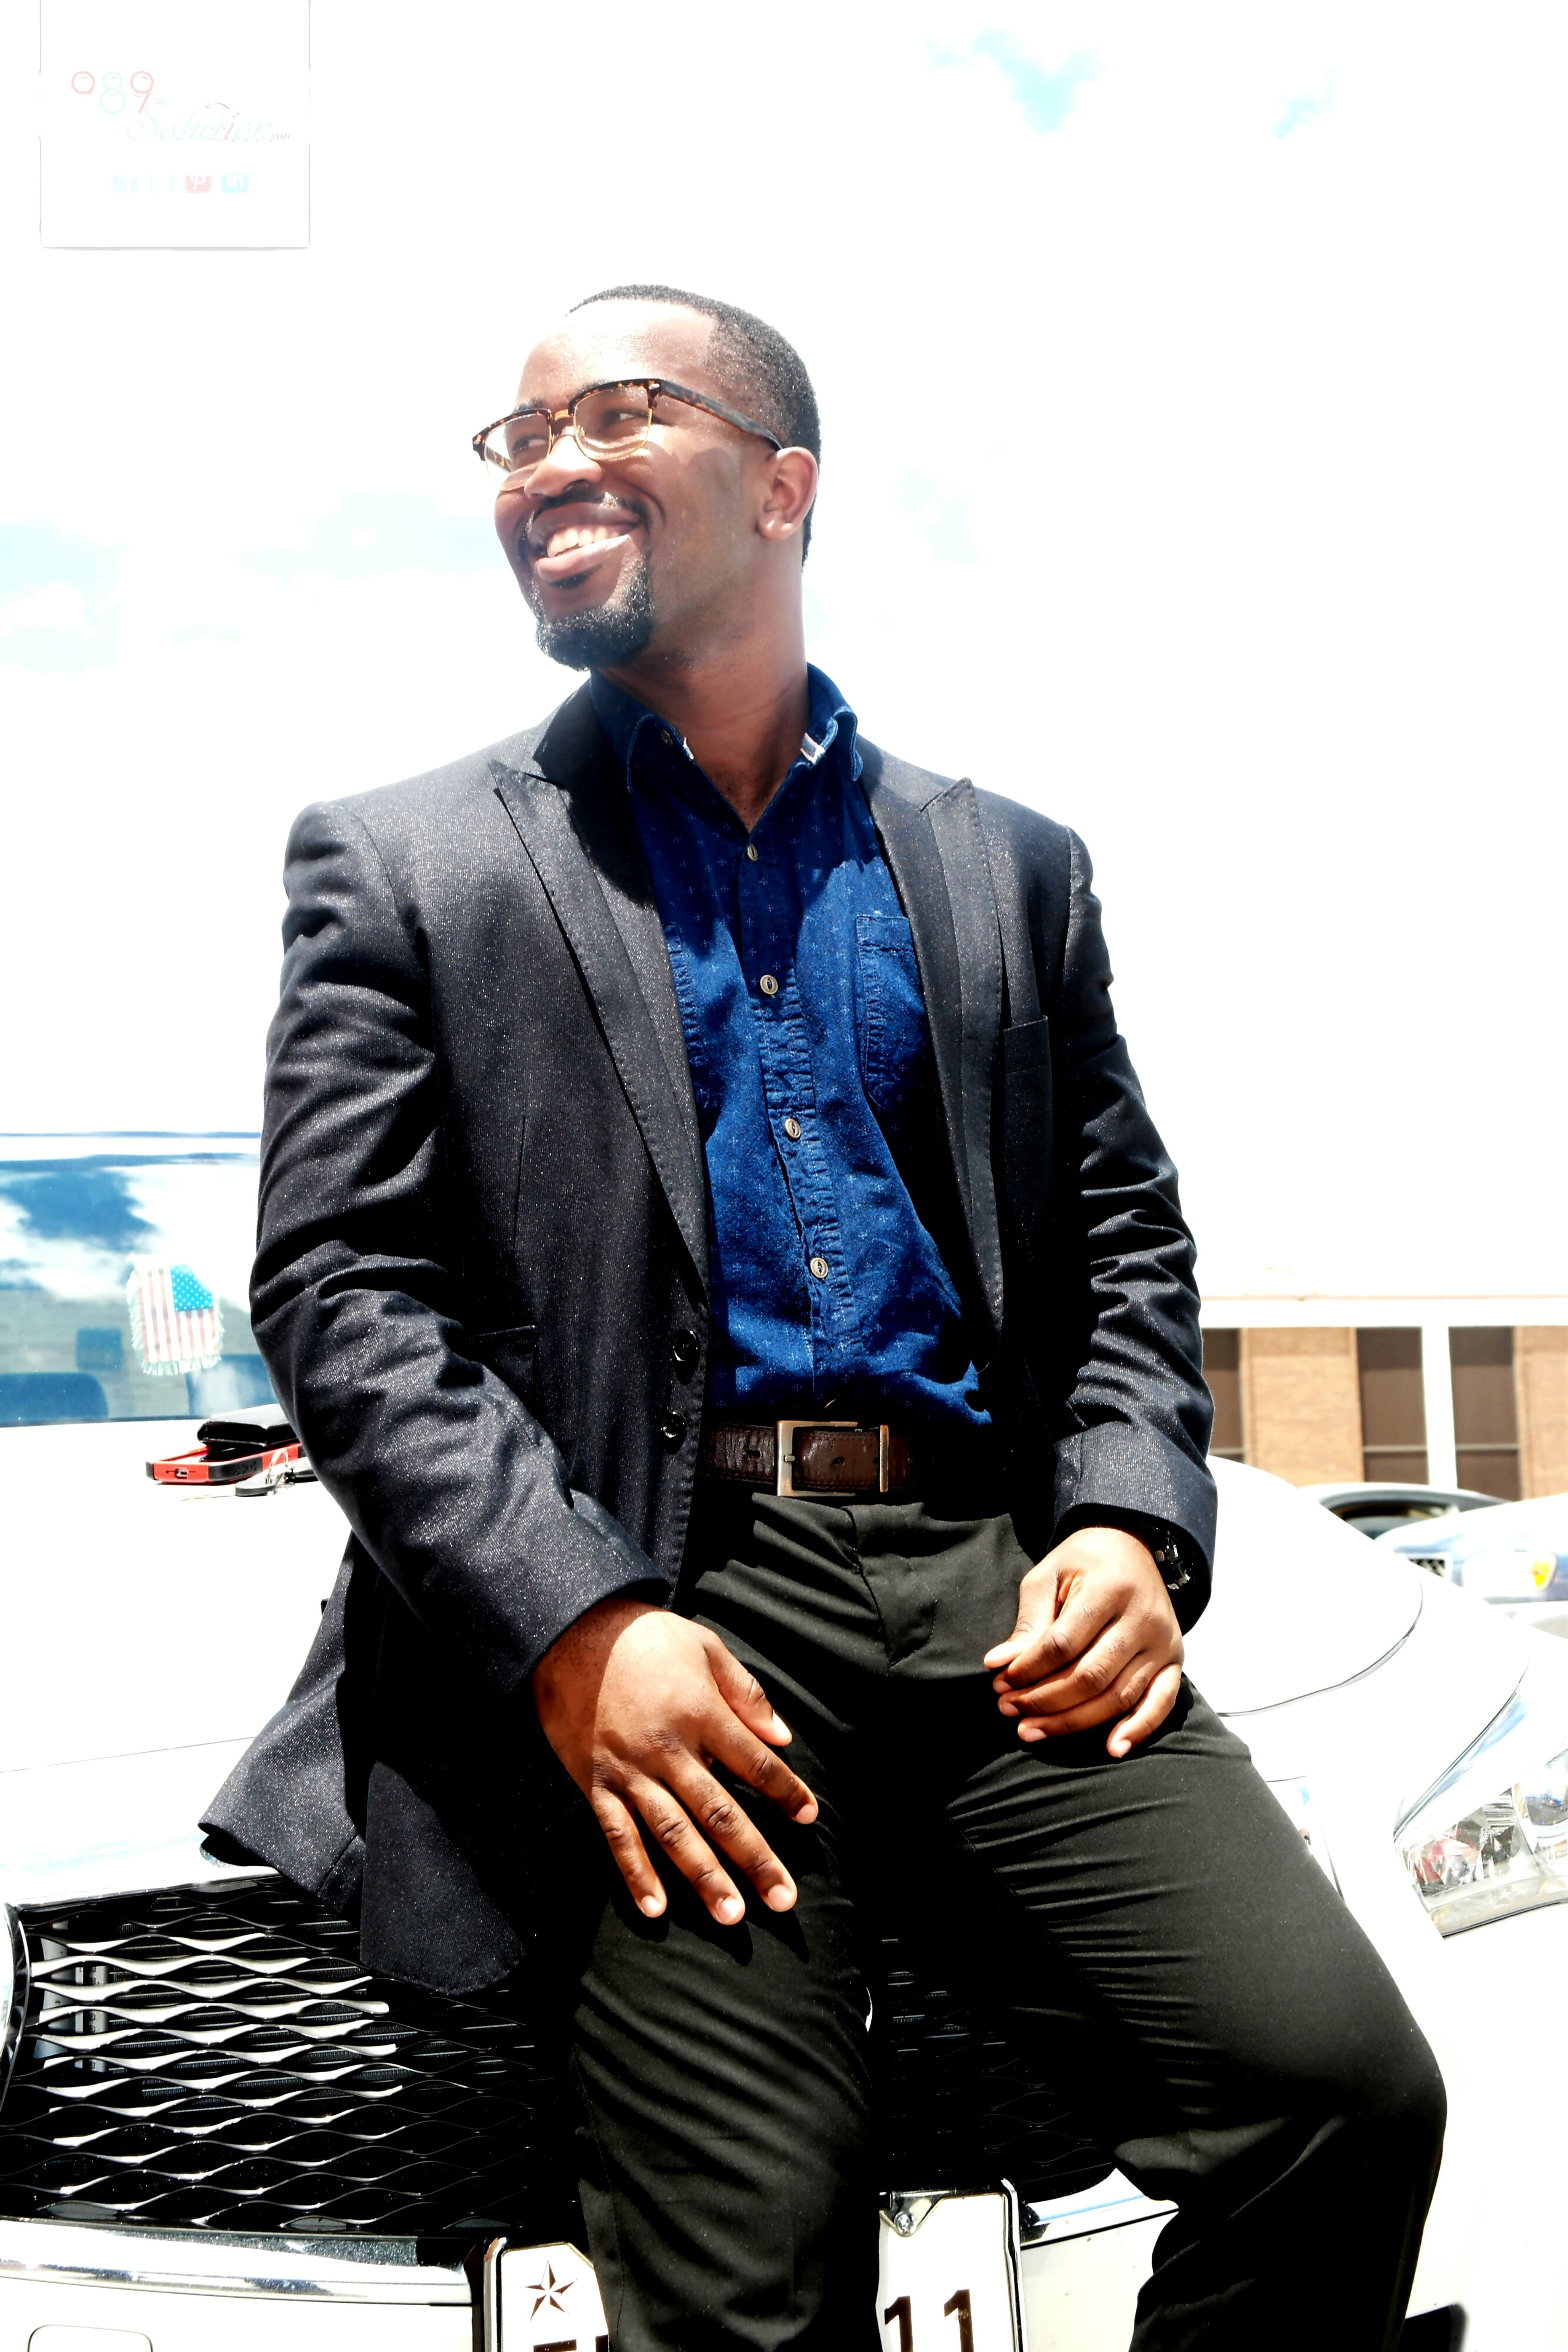 Handsome African Man With Goals Blackman Squad GQ Gentleman